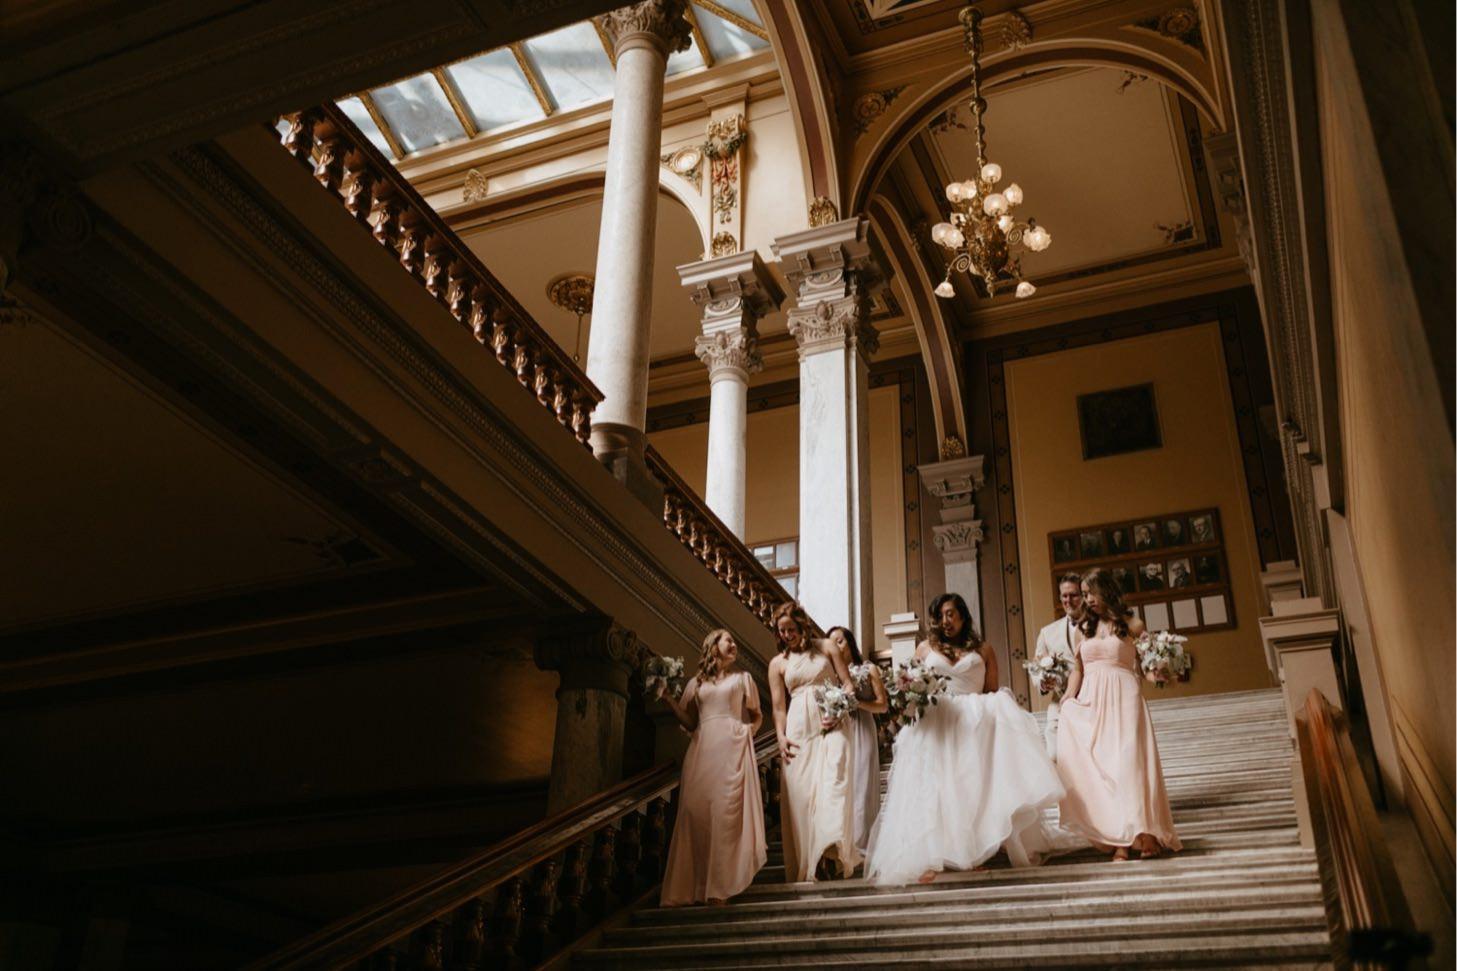 indiana-state-house-wedding-downtown-indianapolis-wedding-photographer070.JPG